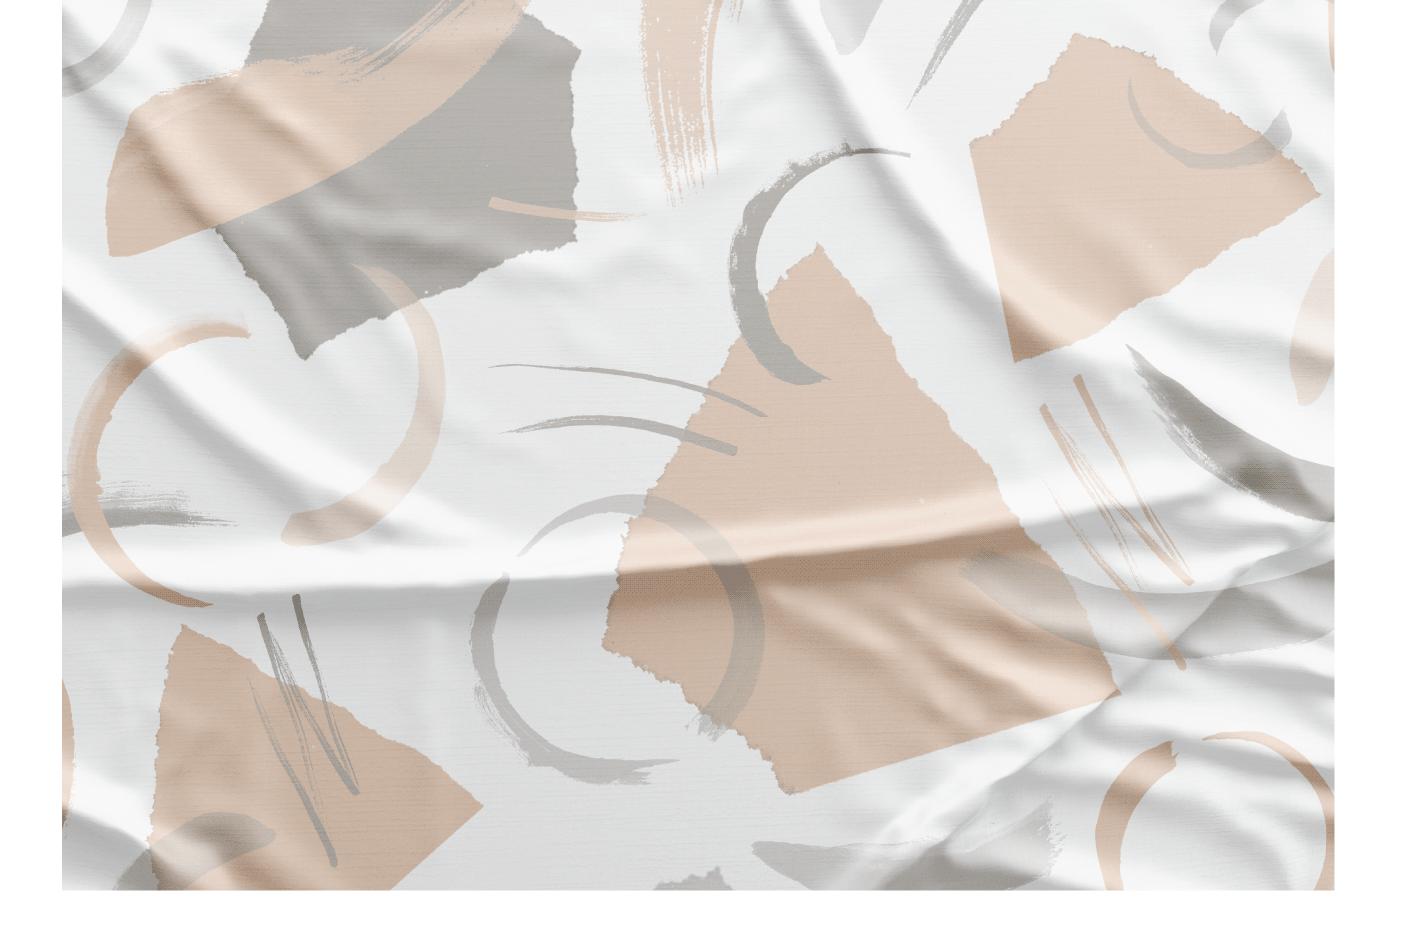 Yomassage pattern by Wink Digital